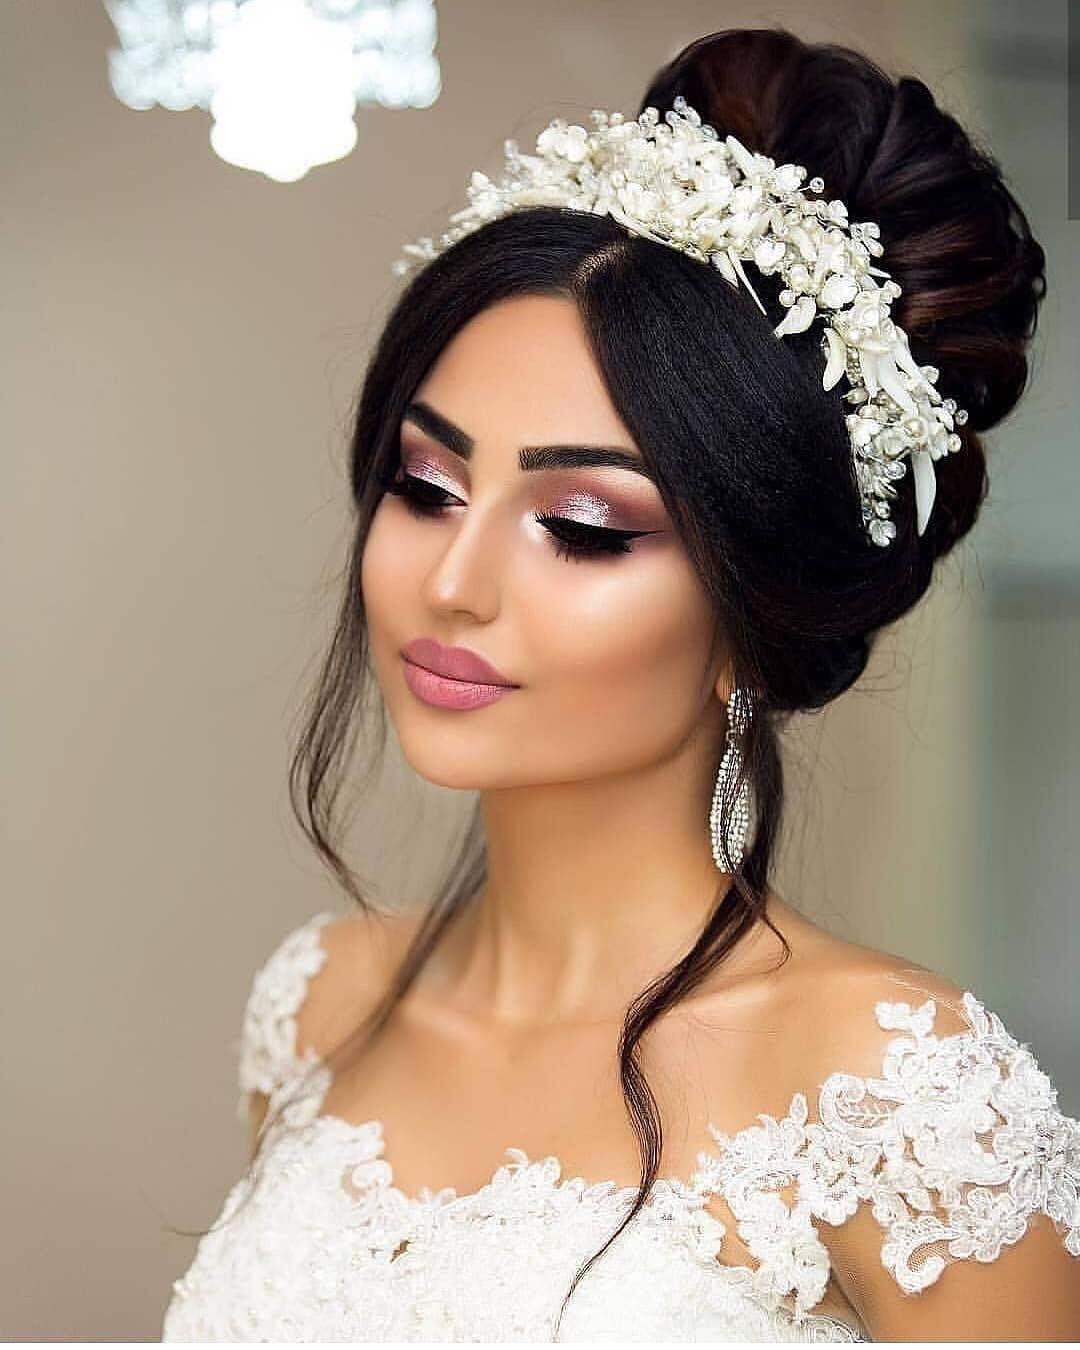 Makyajhileleri Makyajfikirleri Gelinmakyaji Gozmakyaji Makeuptips Bridal Hair And Makeup Wedding Hair And Makeup Wedding Makeup Looks